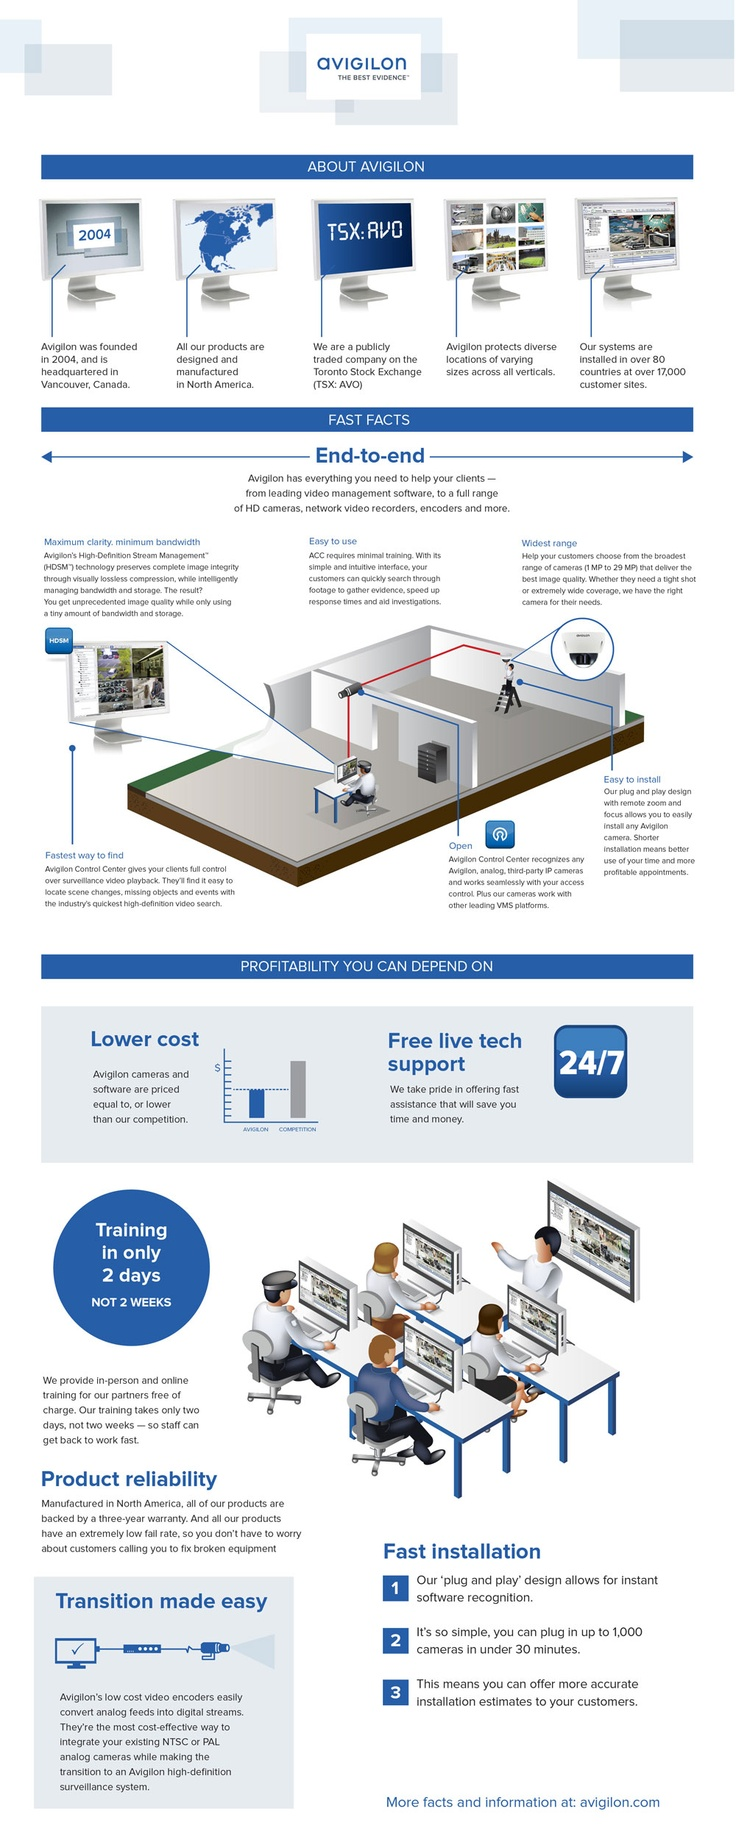 Nice Avigilon Infographic